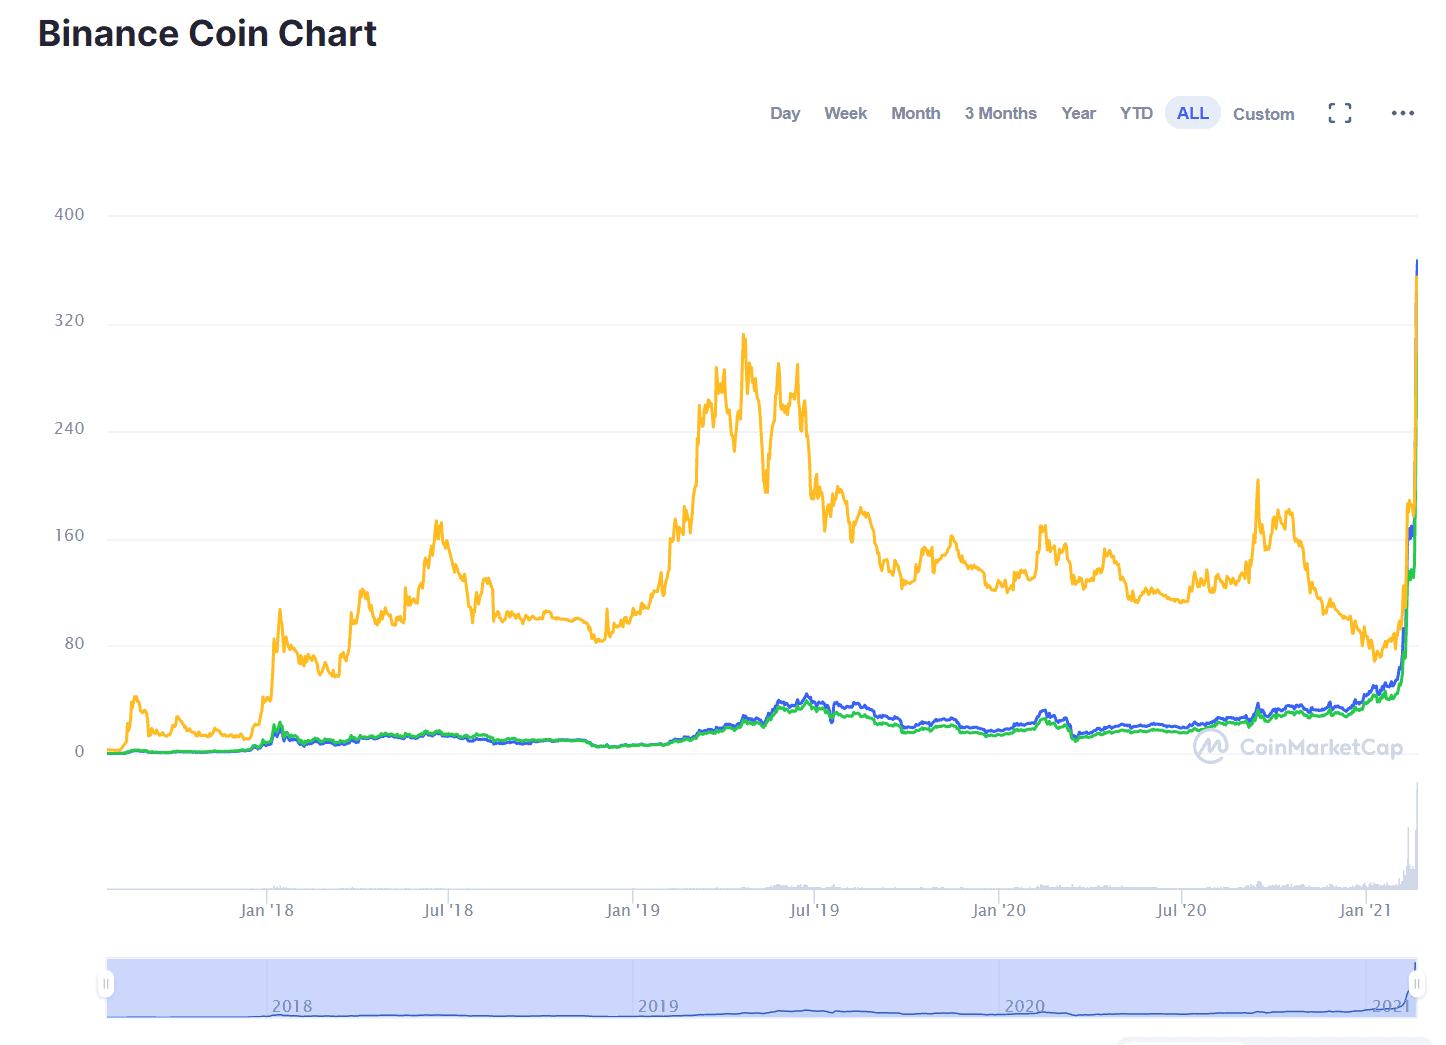 bnb-price-chart